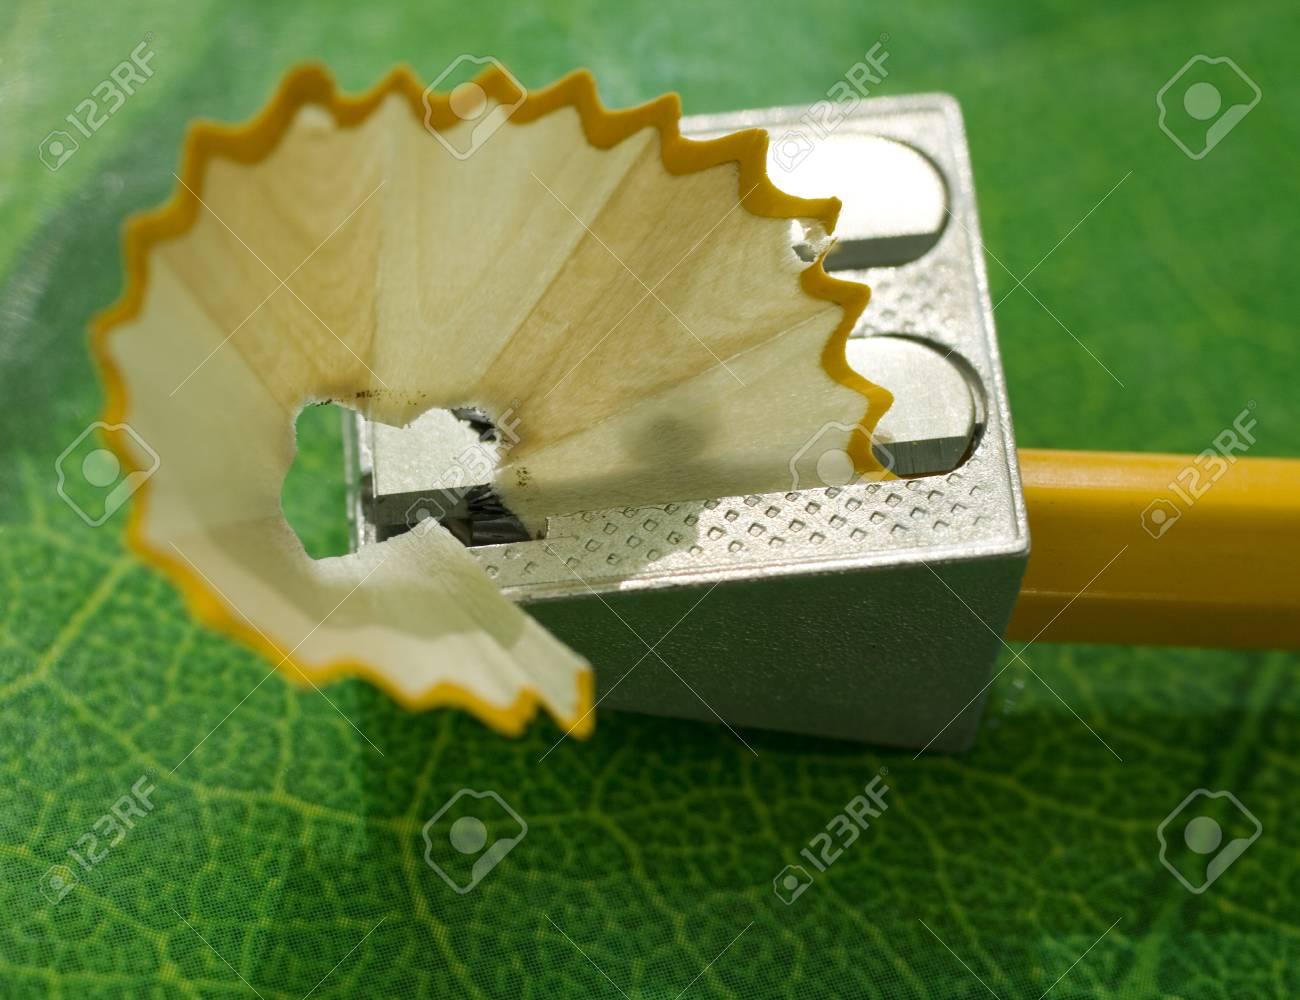 Pencil sharpneer Stock Photo - 9813800